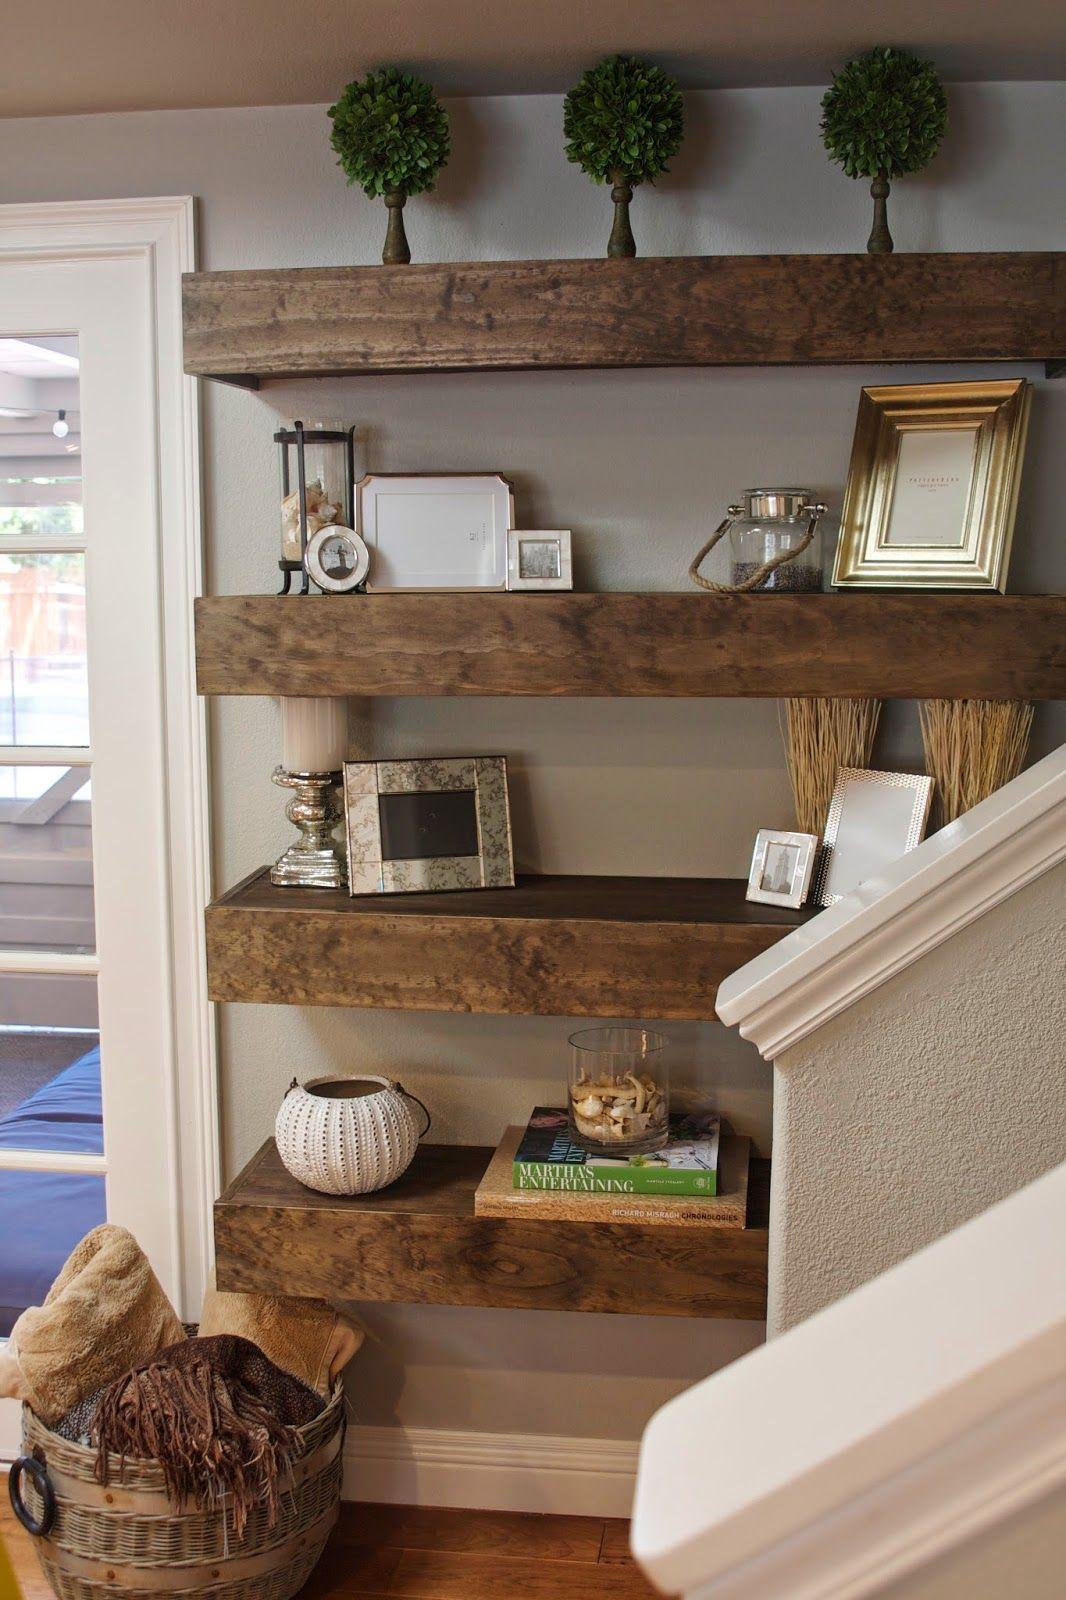 Simple DIY Floating Shelves Tutorial + Decor Ideas